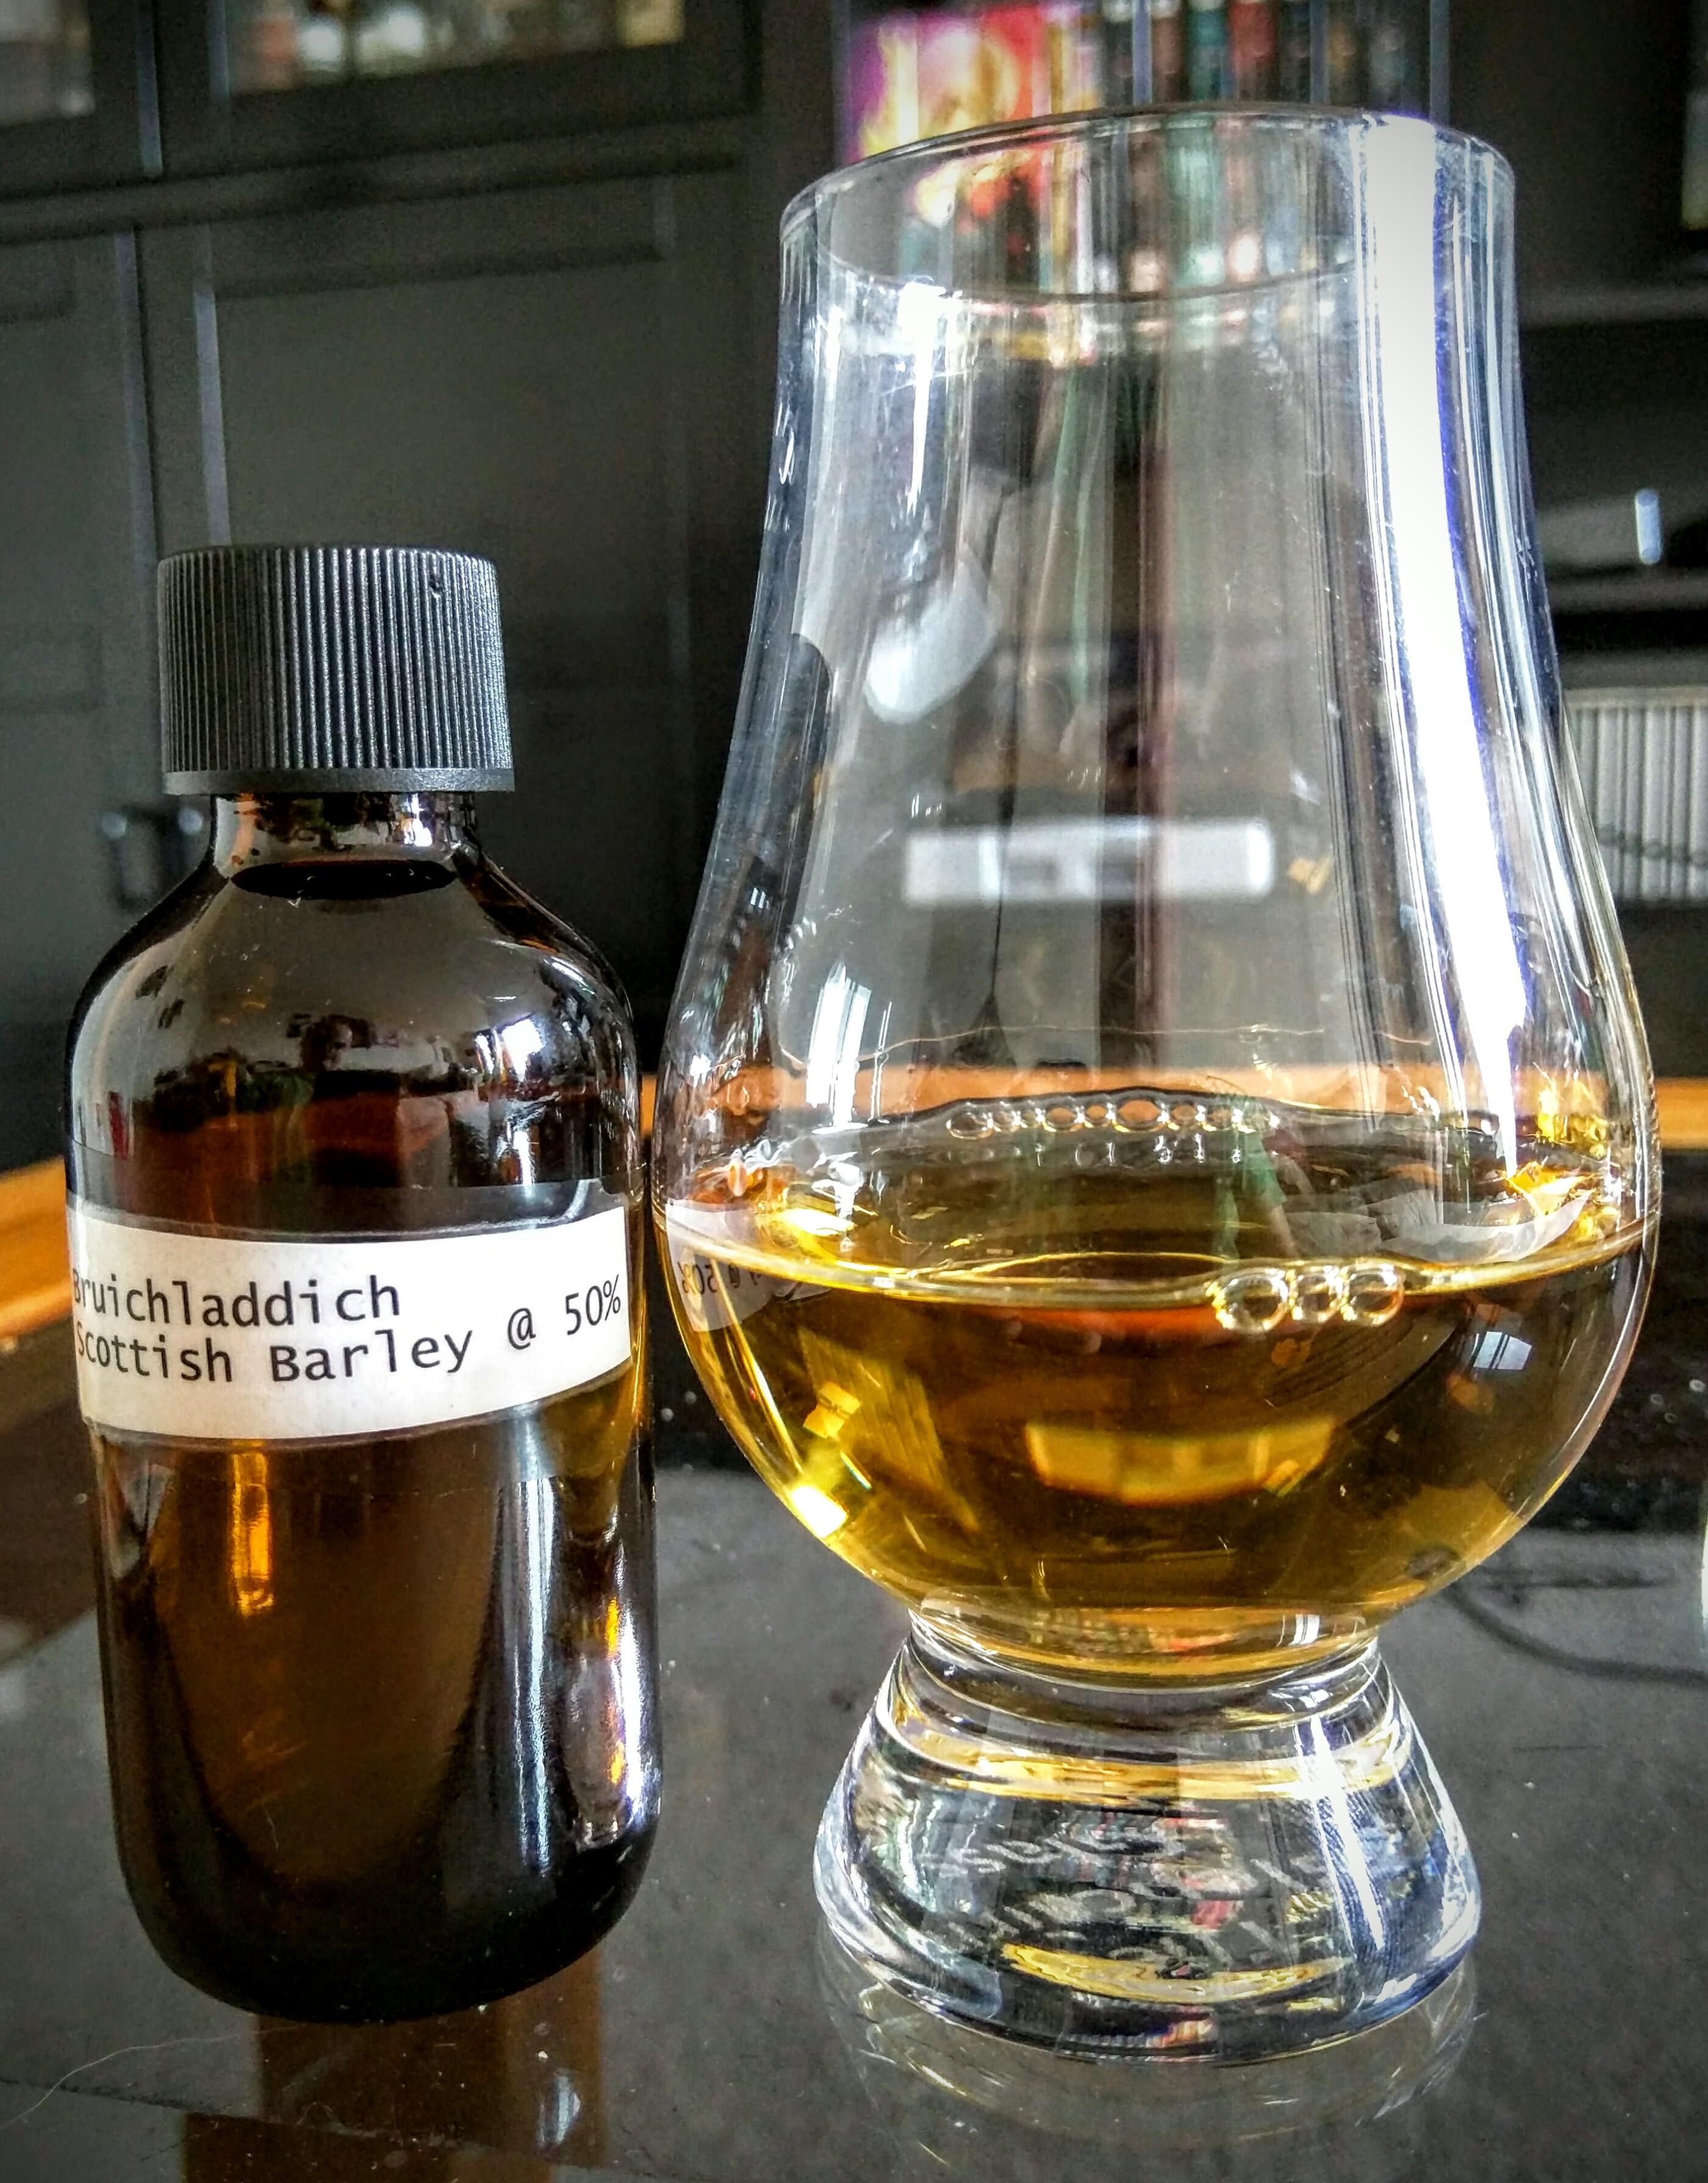 Bruichladdich the classic laddie scottish barley - Bruichladdich port charlotte heavily peated ...